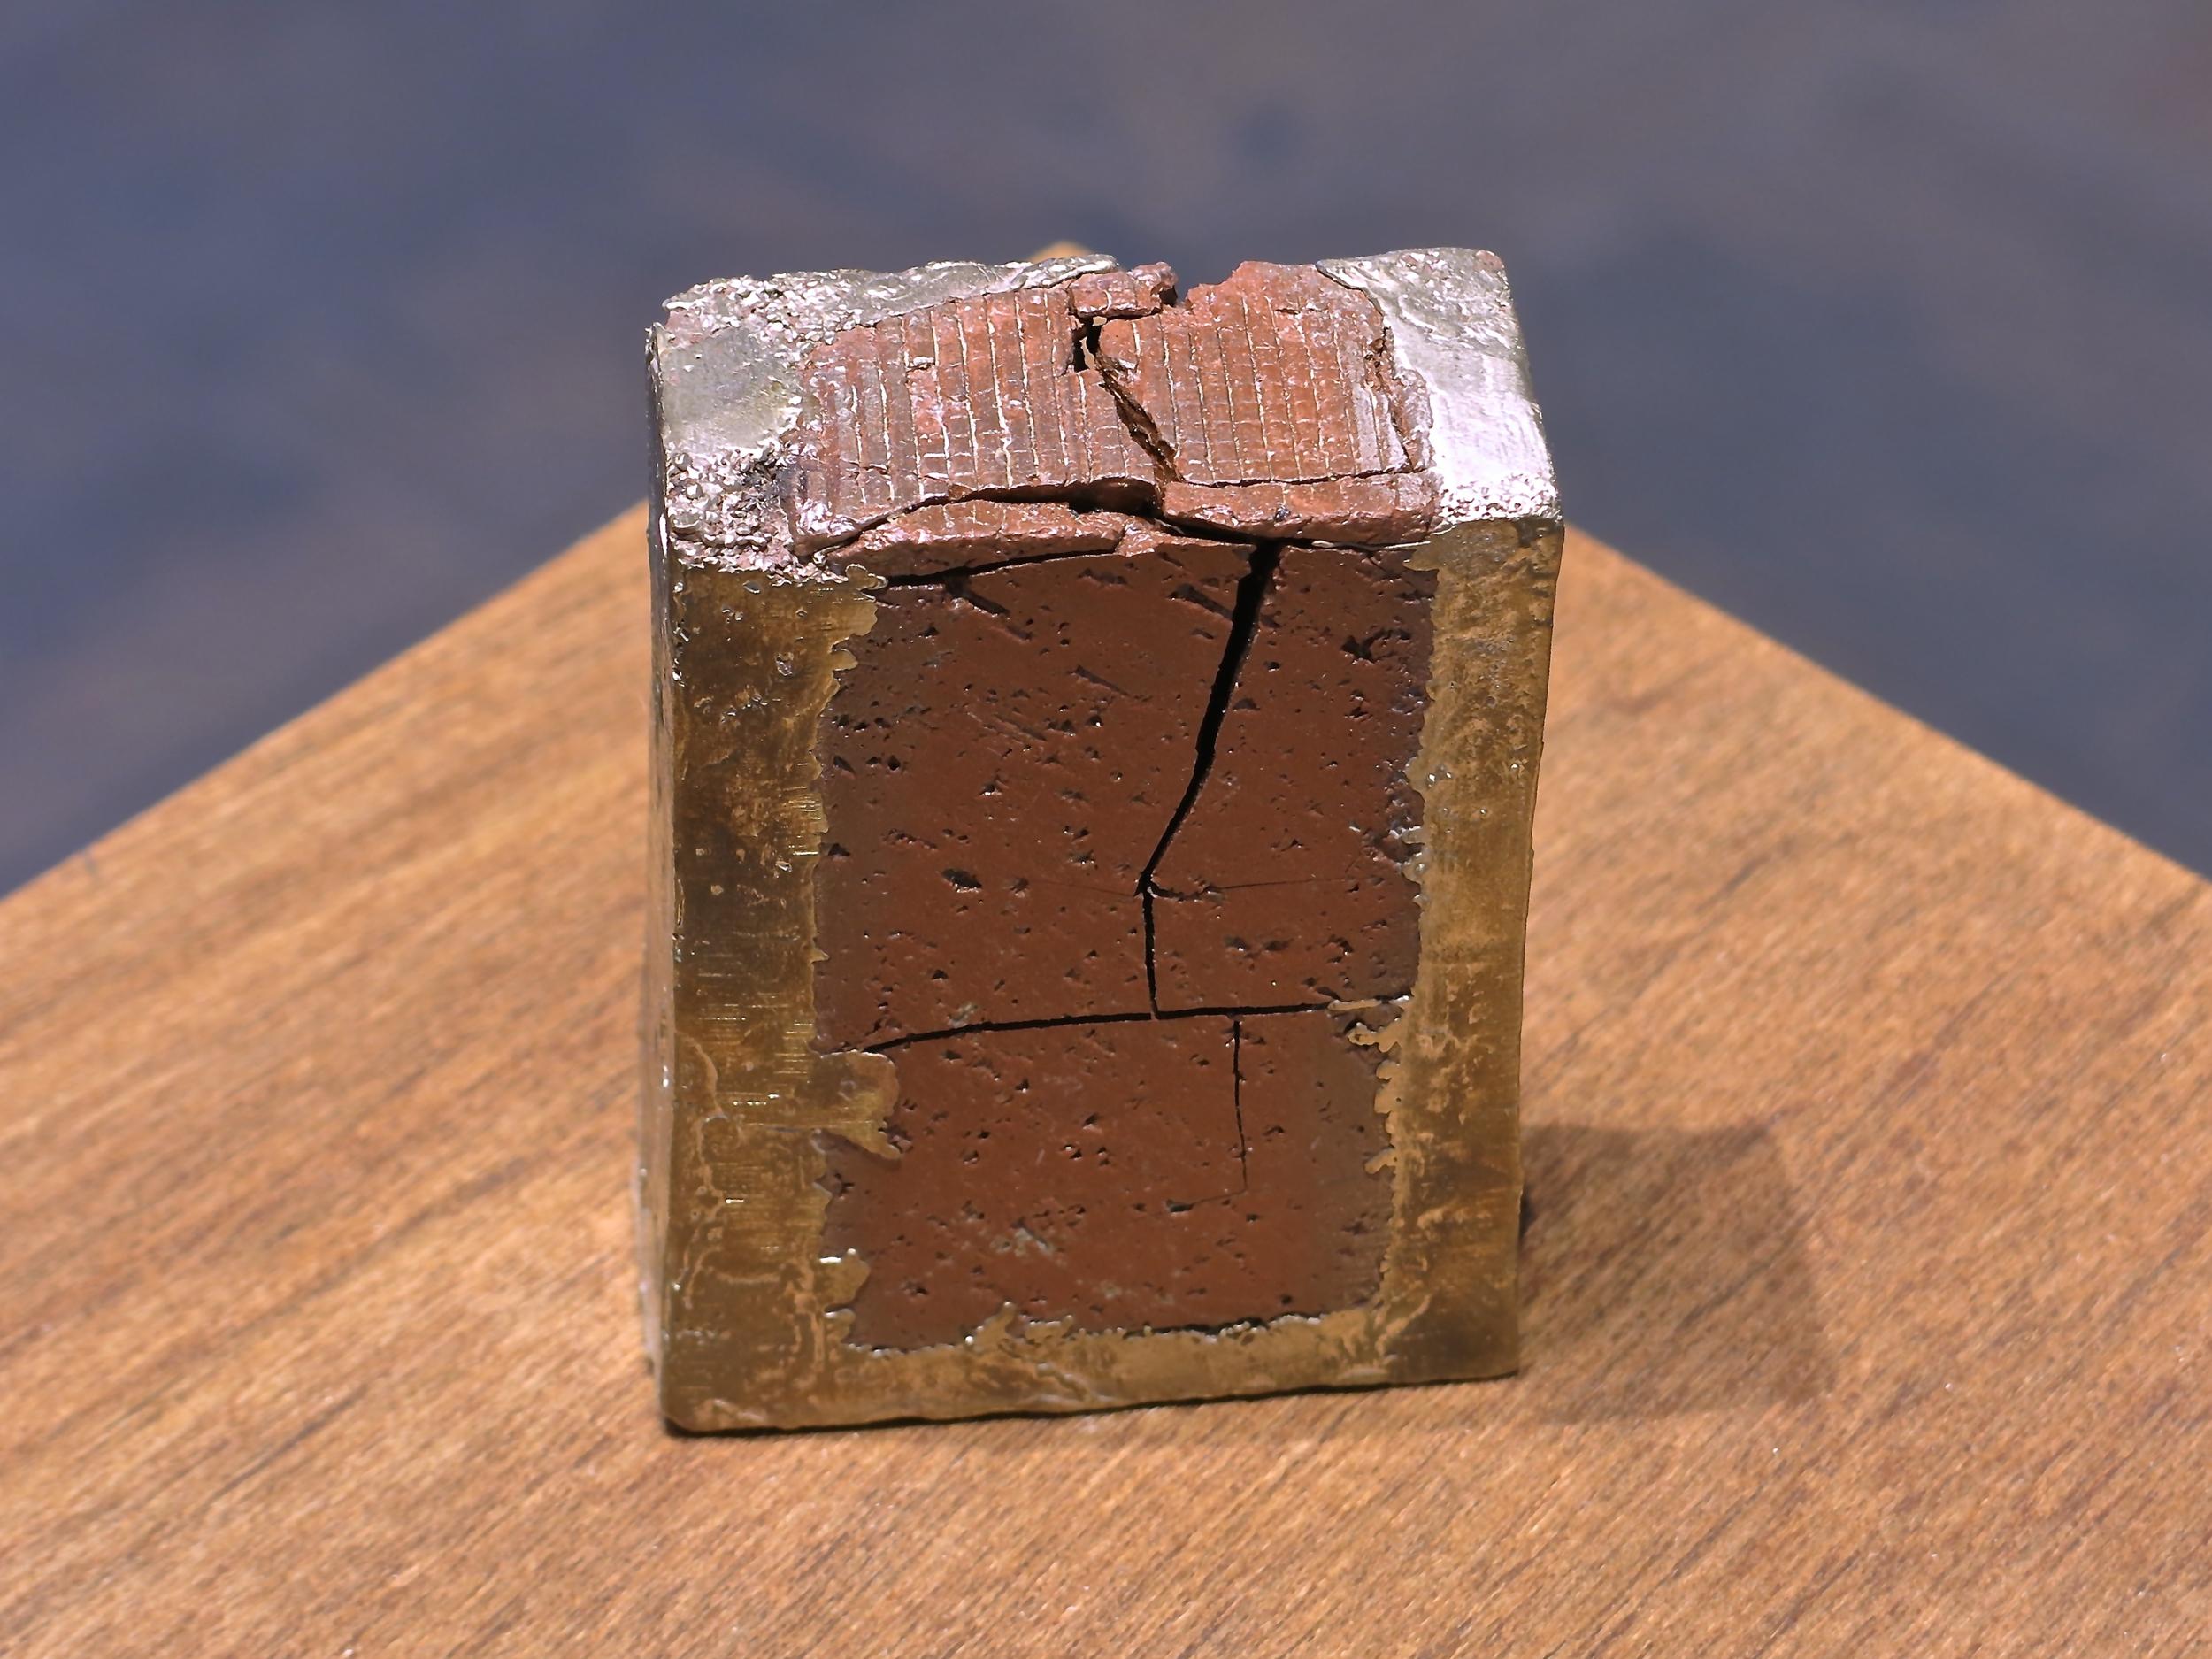 "Broken #3 | H. 2.5"" W. 2.5"" D. 1"" | Bronze and found object | Year 2014 | Photo: Mazdak Shadkam"